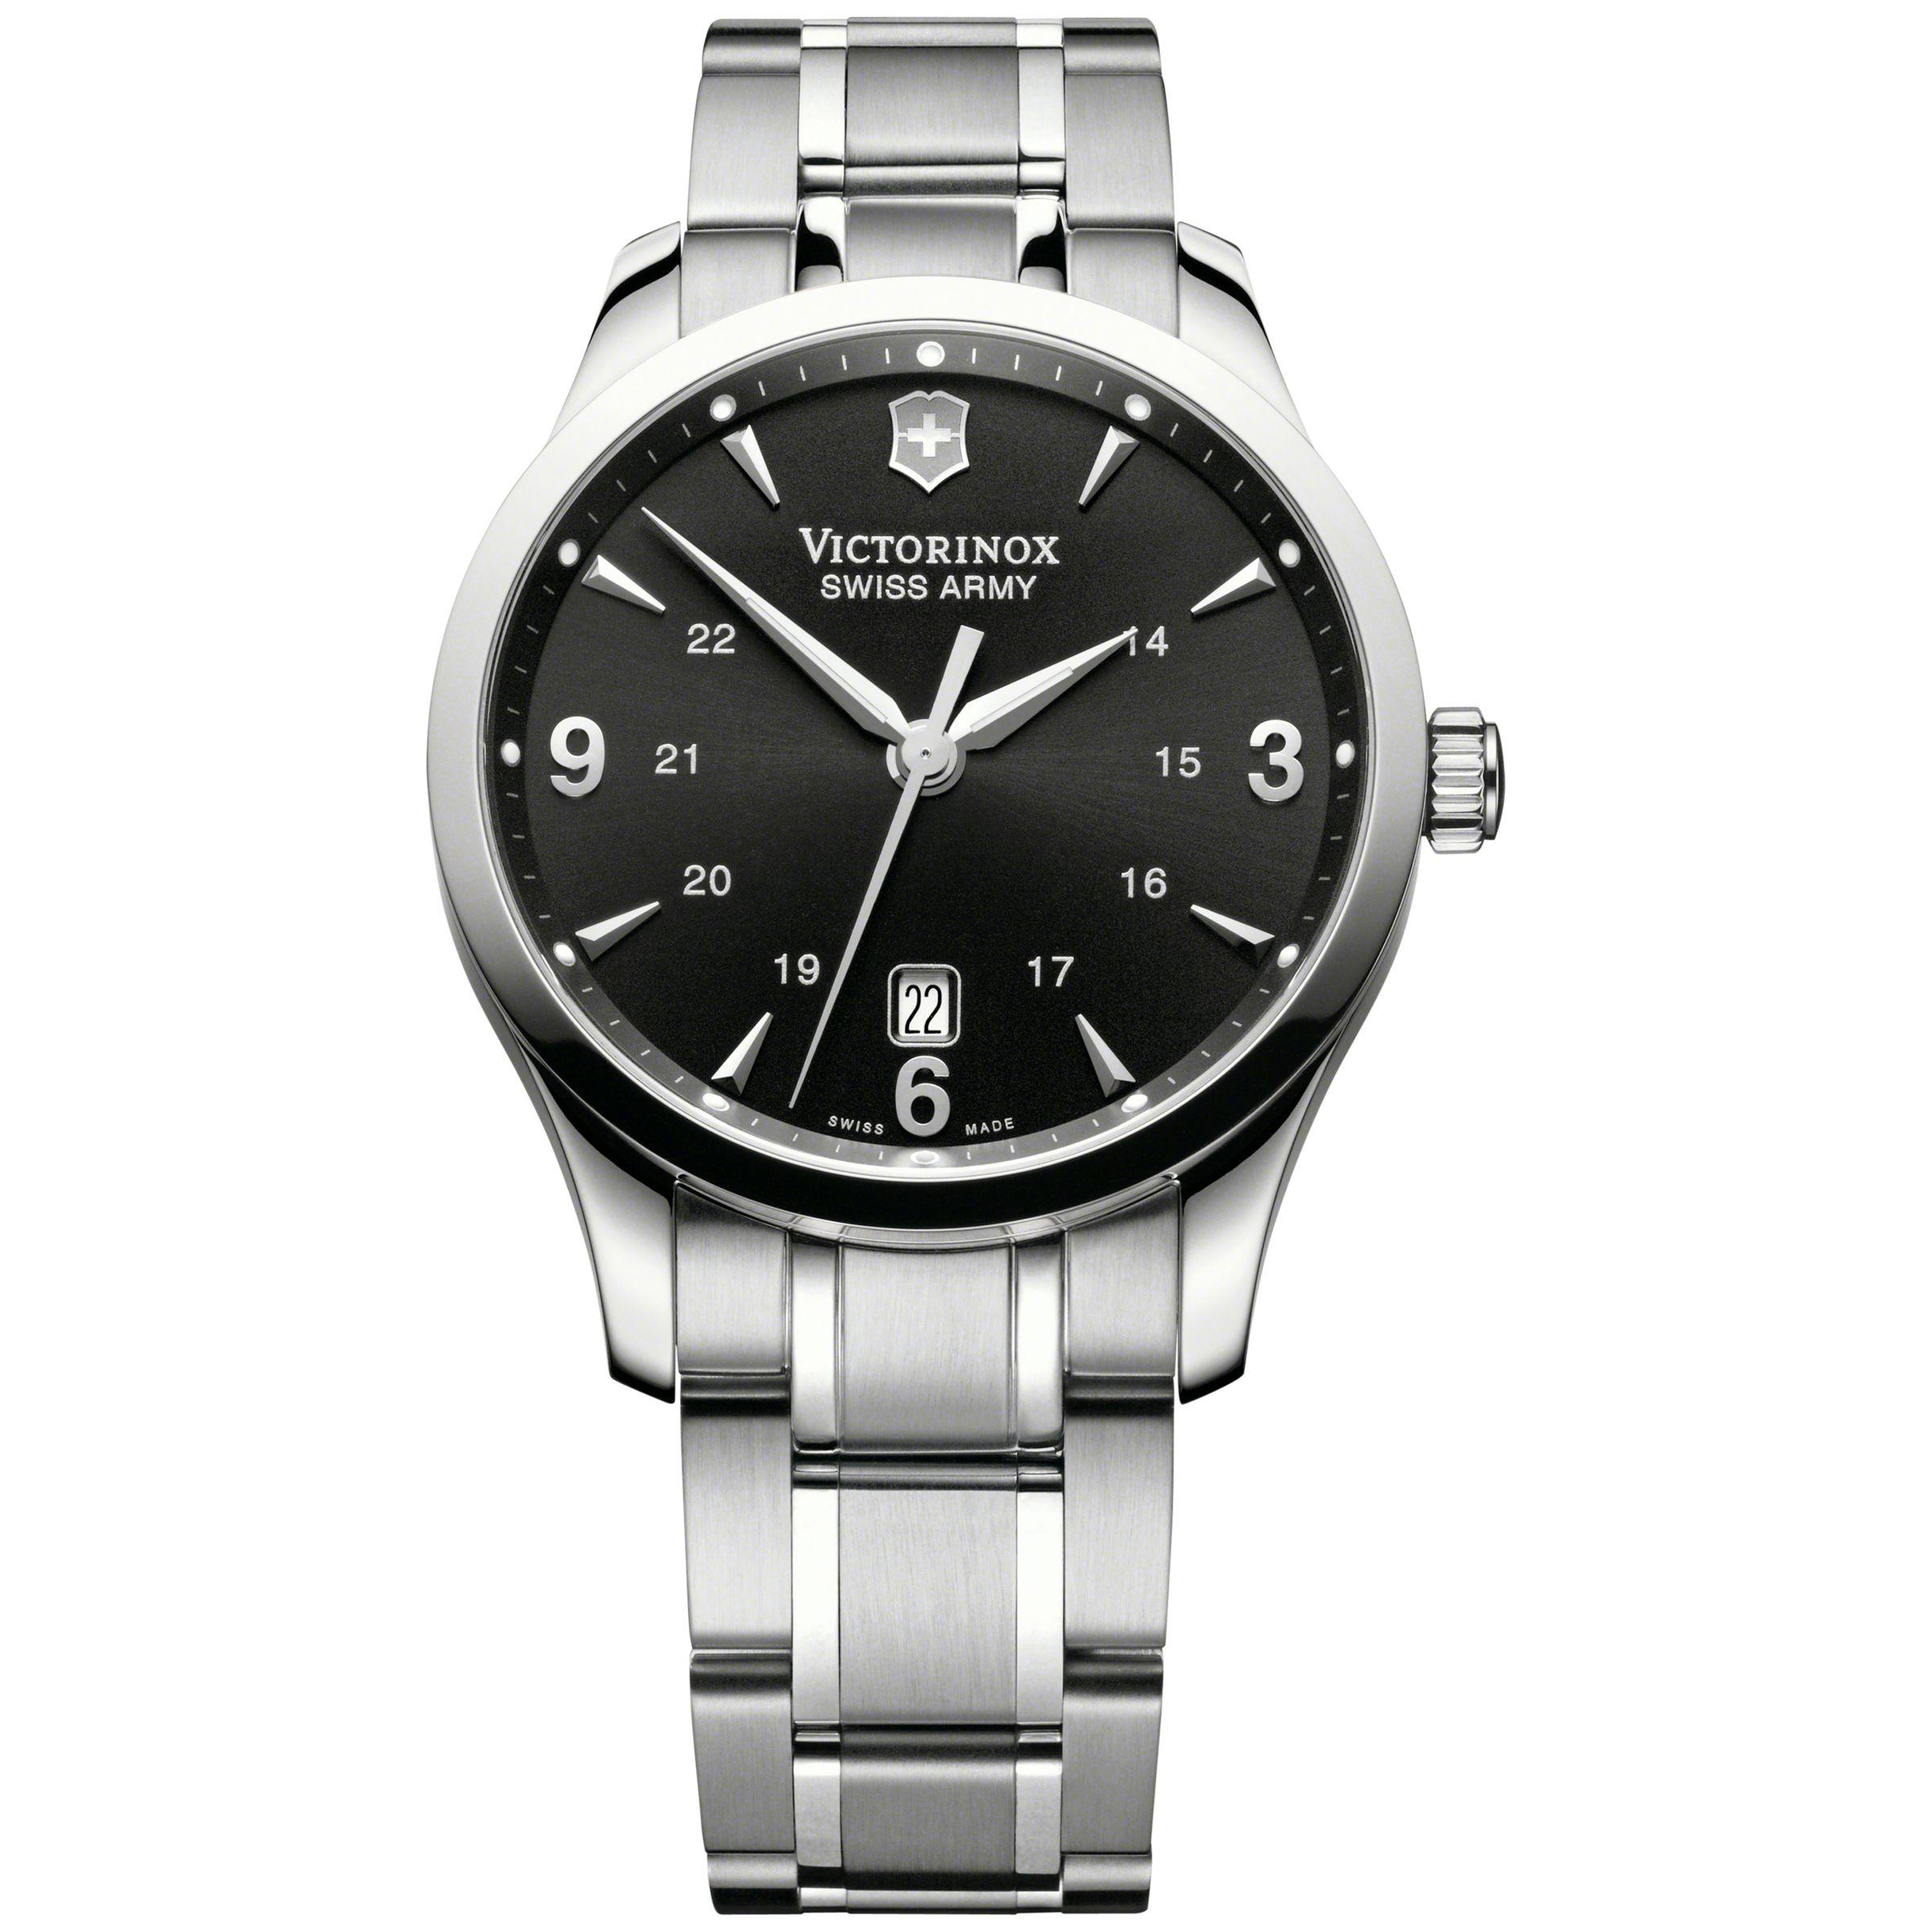 Victorinox Victorinox 241473 Men's Alliance Bracelet Strap Watch, Silver/Black